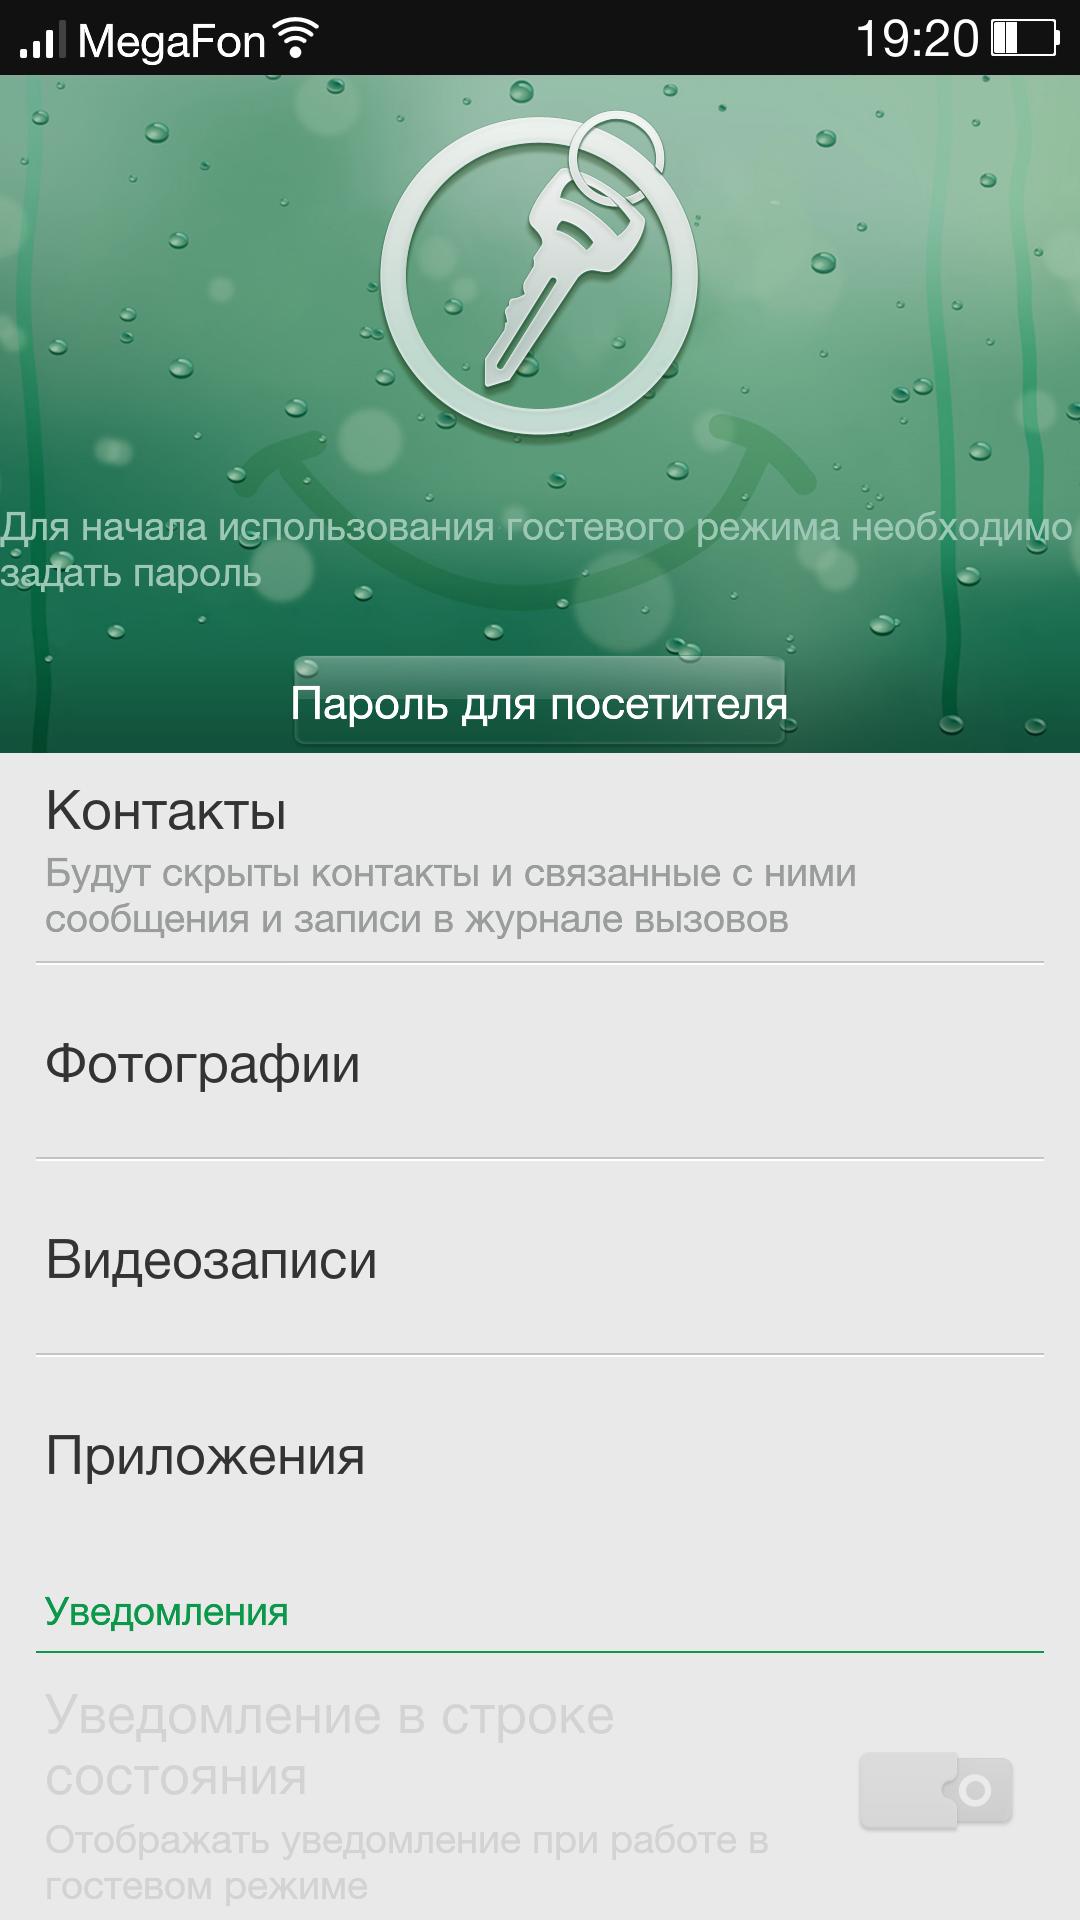 Screenshot_2013-10-26-19-20-33